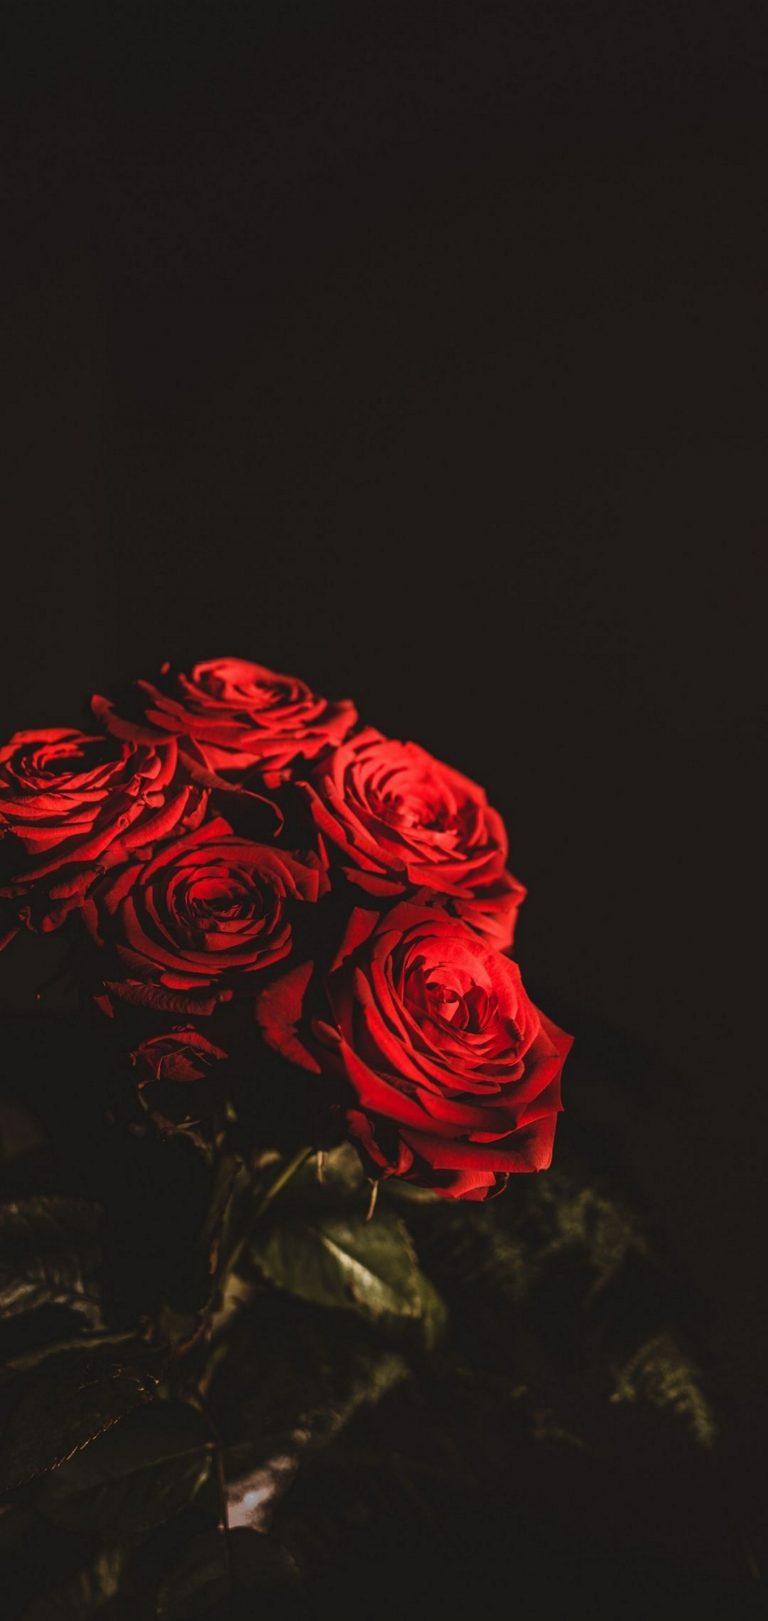 Dark Red Flowers Bouquet Wallpaper 1440x3040 768x1621